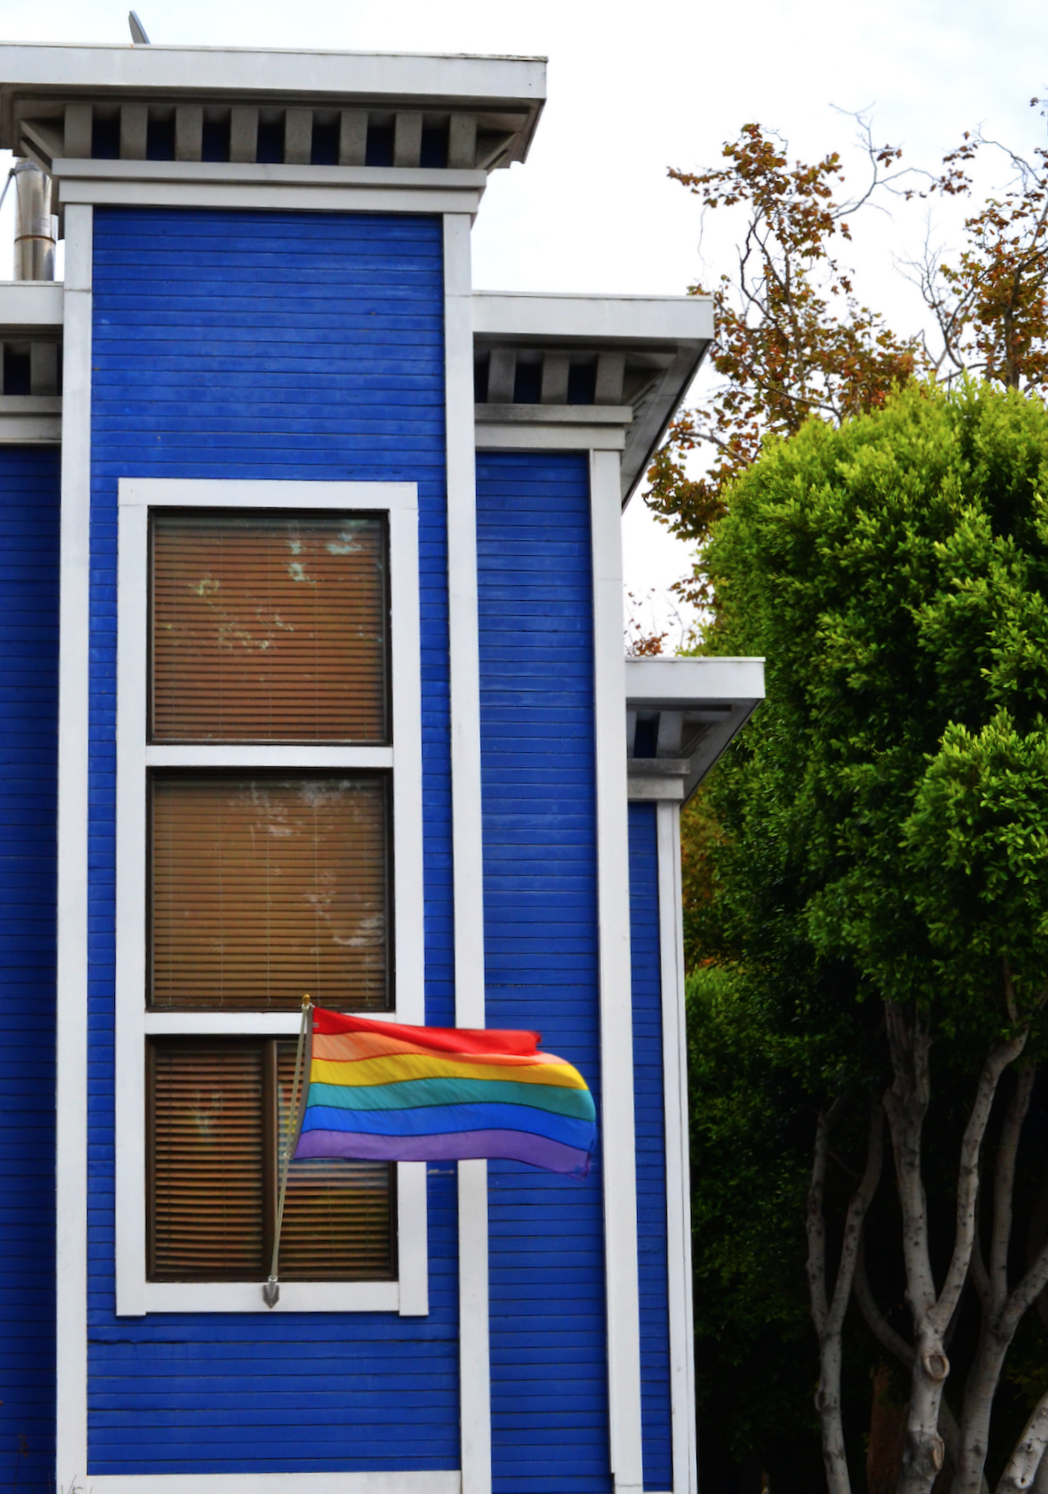 Aliana Grace Bailey San Francisco California Love Wins Gay Pride.png